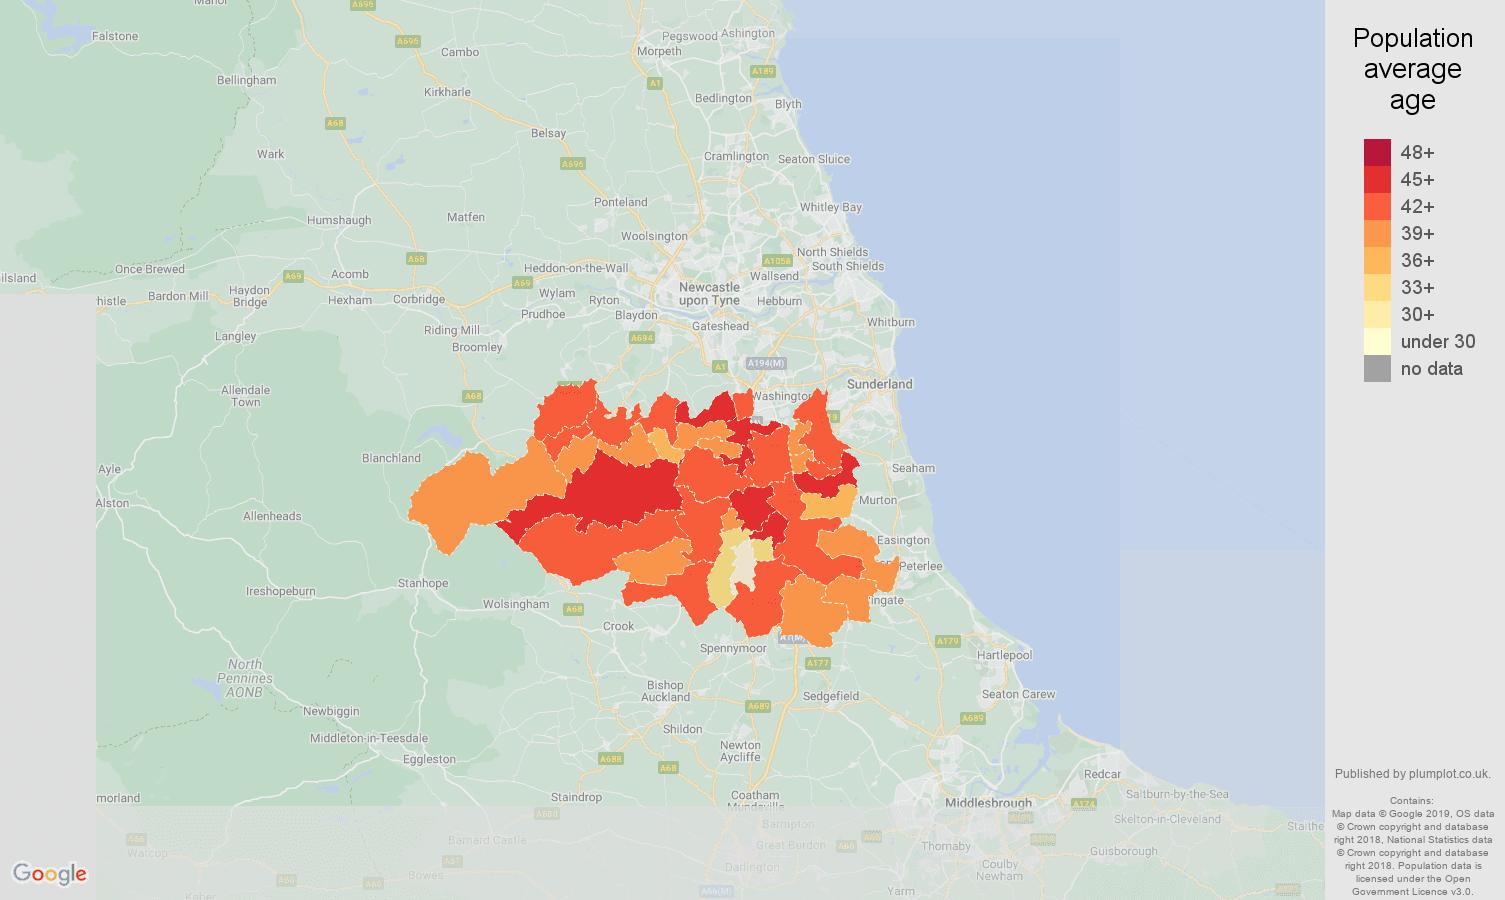 Durham population average age map